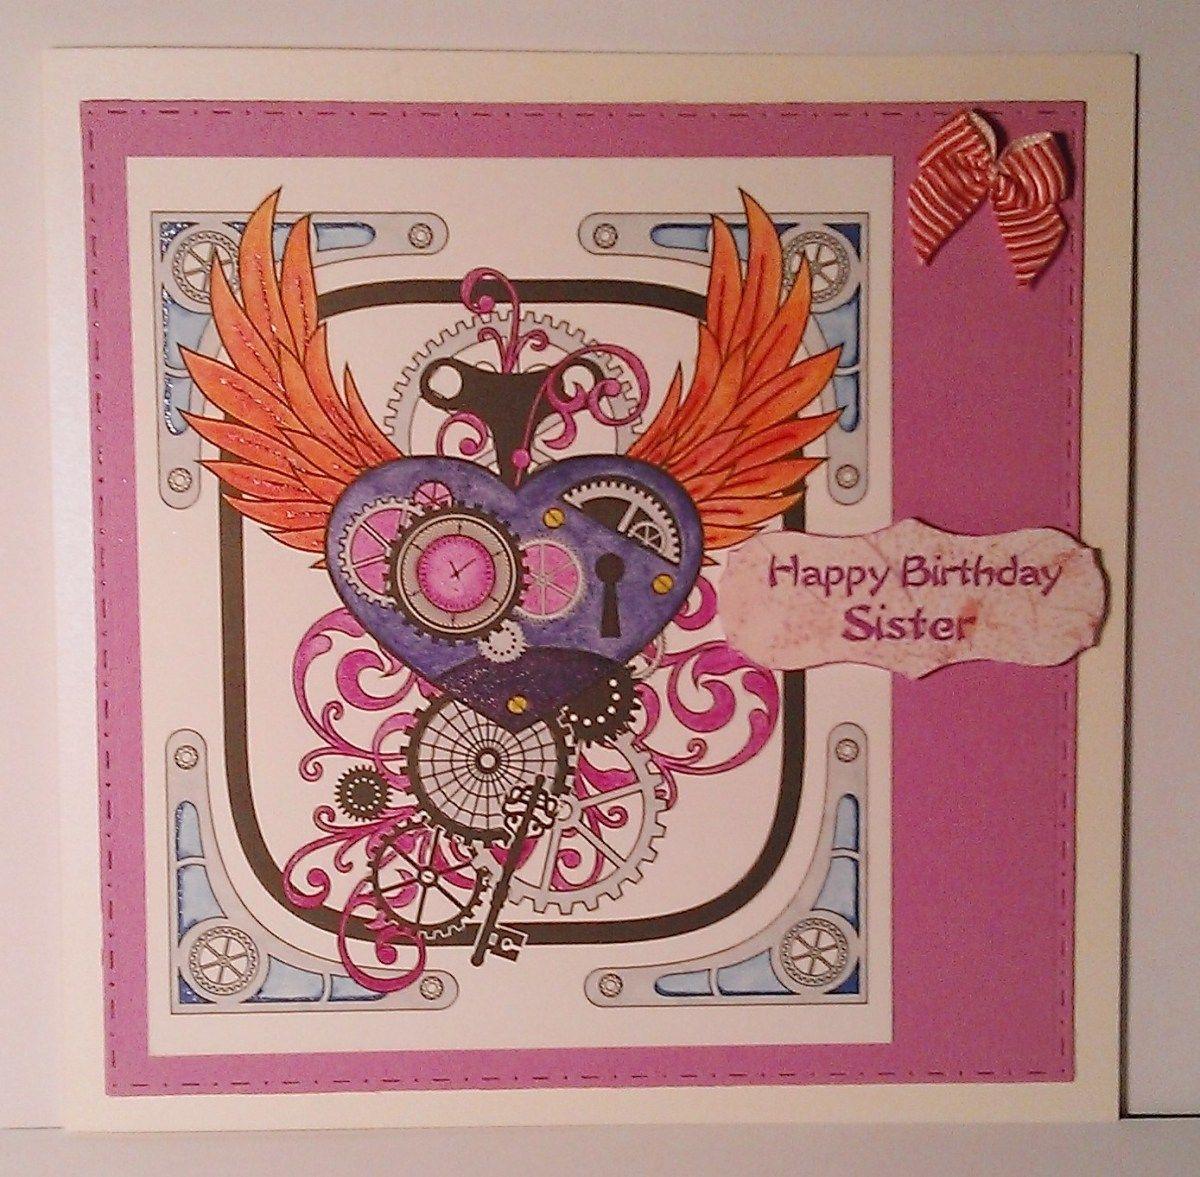 Happy birthday sister card conscious crafties happy